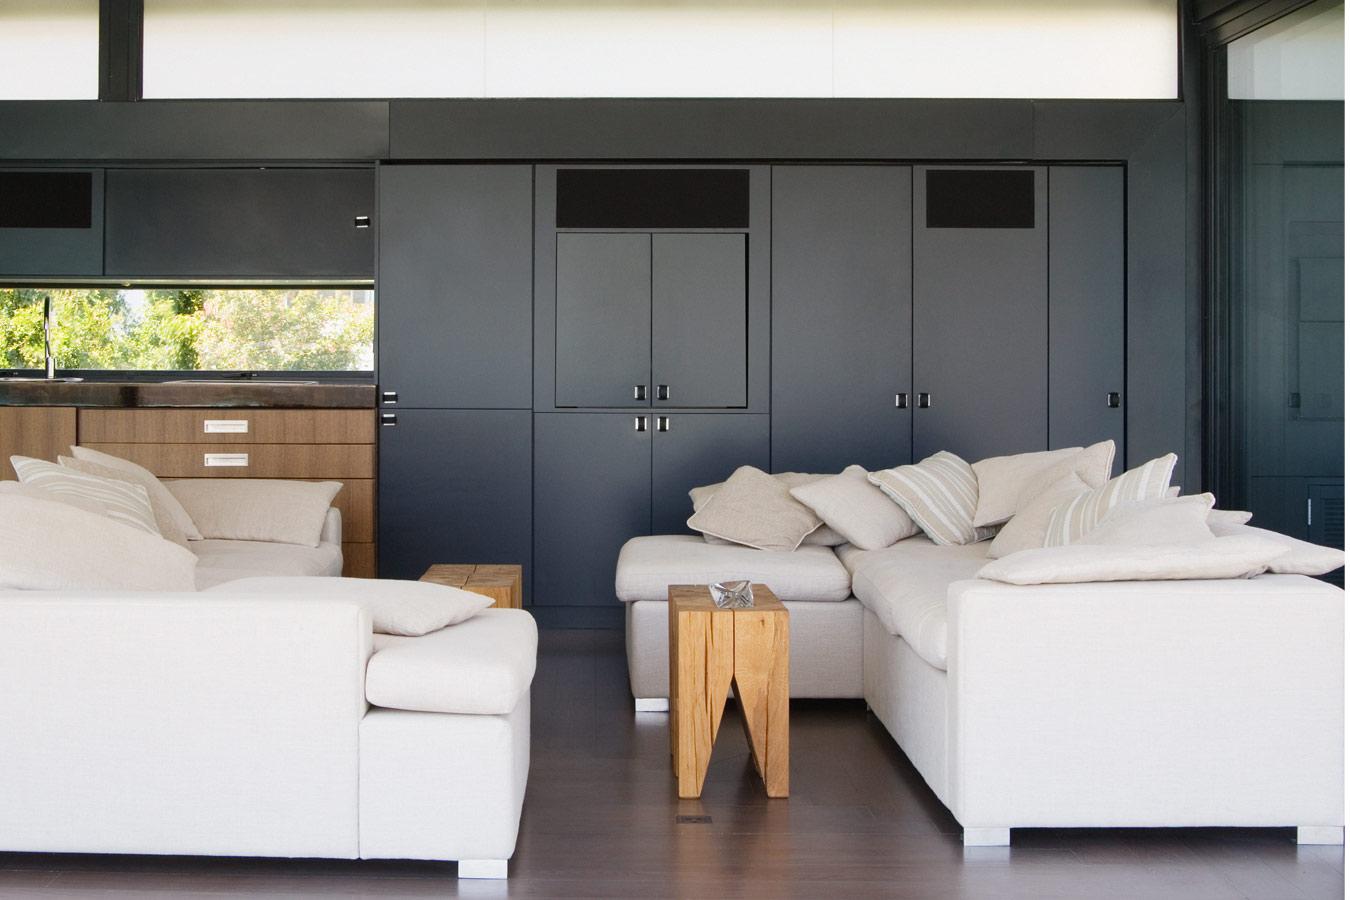 Woonkamer Ideeen Wit : Ideeen woonkamer interieur ideeen woonkamer fotos in top fotos